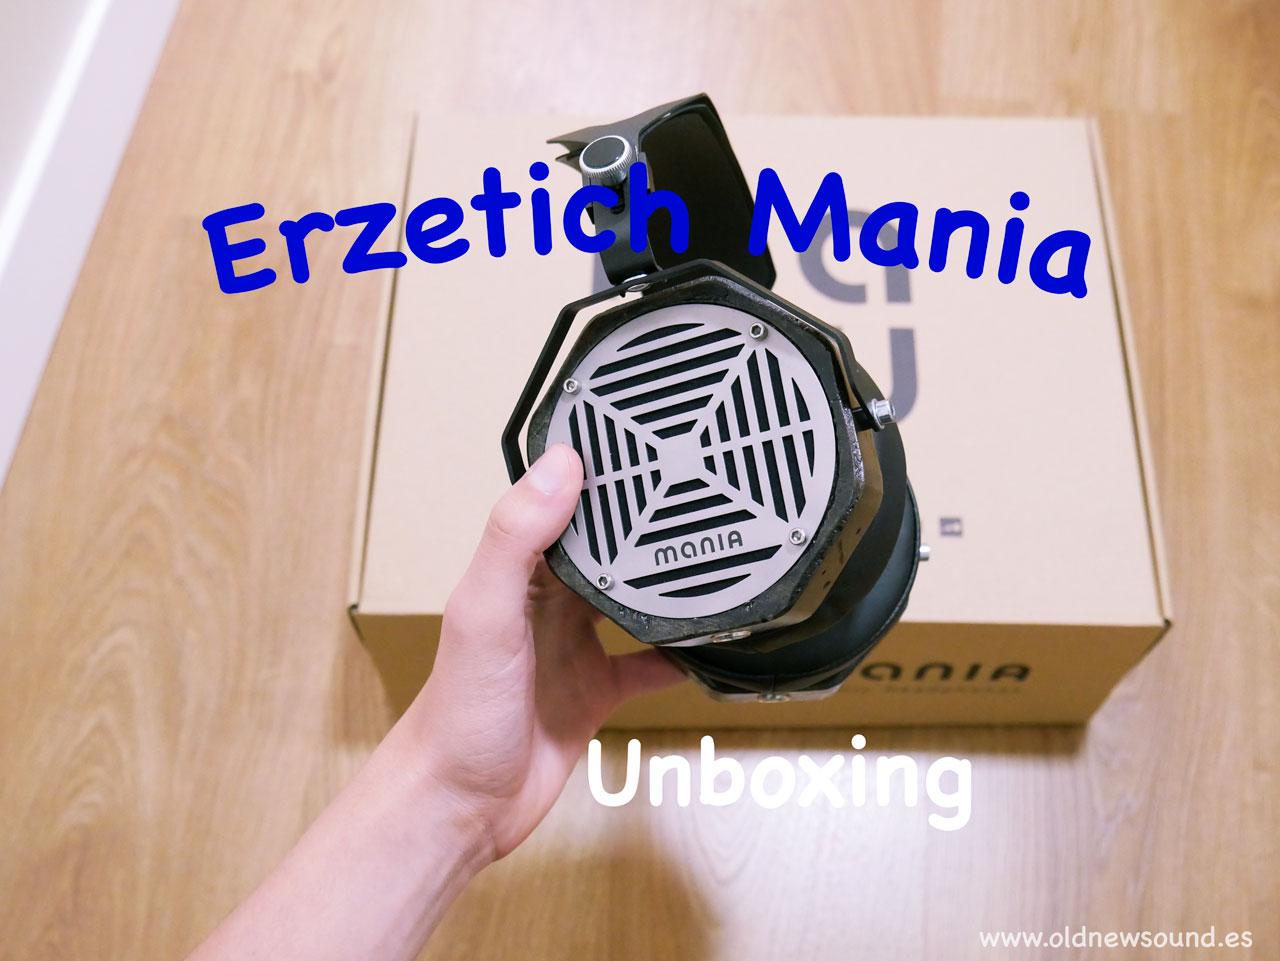 Erzetich Mania Unboxing